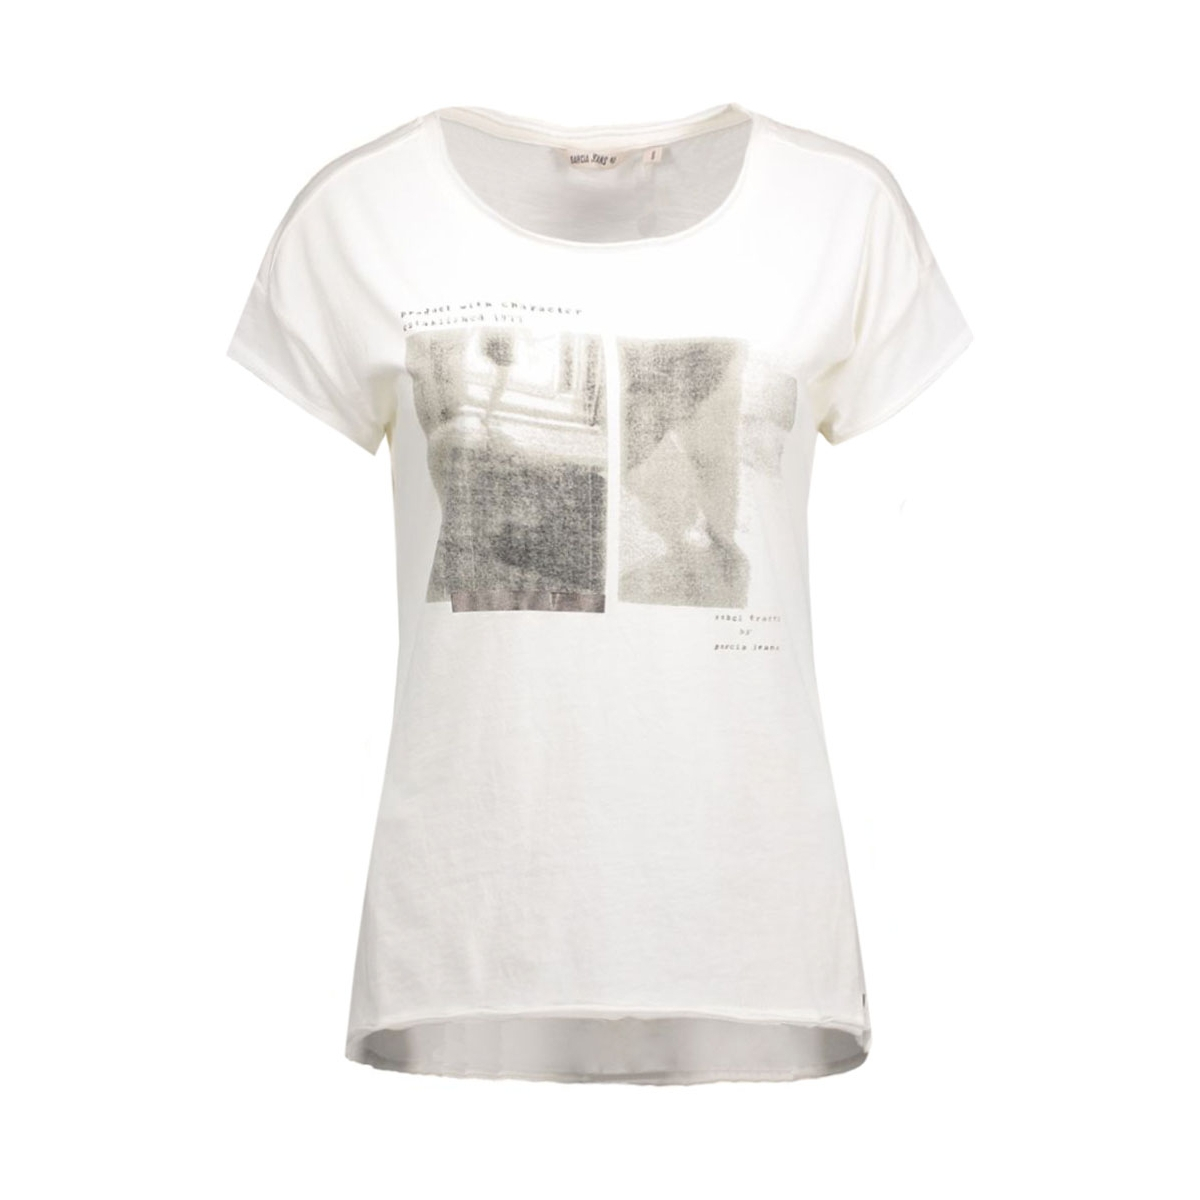 s60017 garcia t-shirt 27 winter white